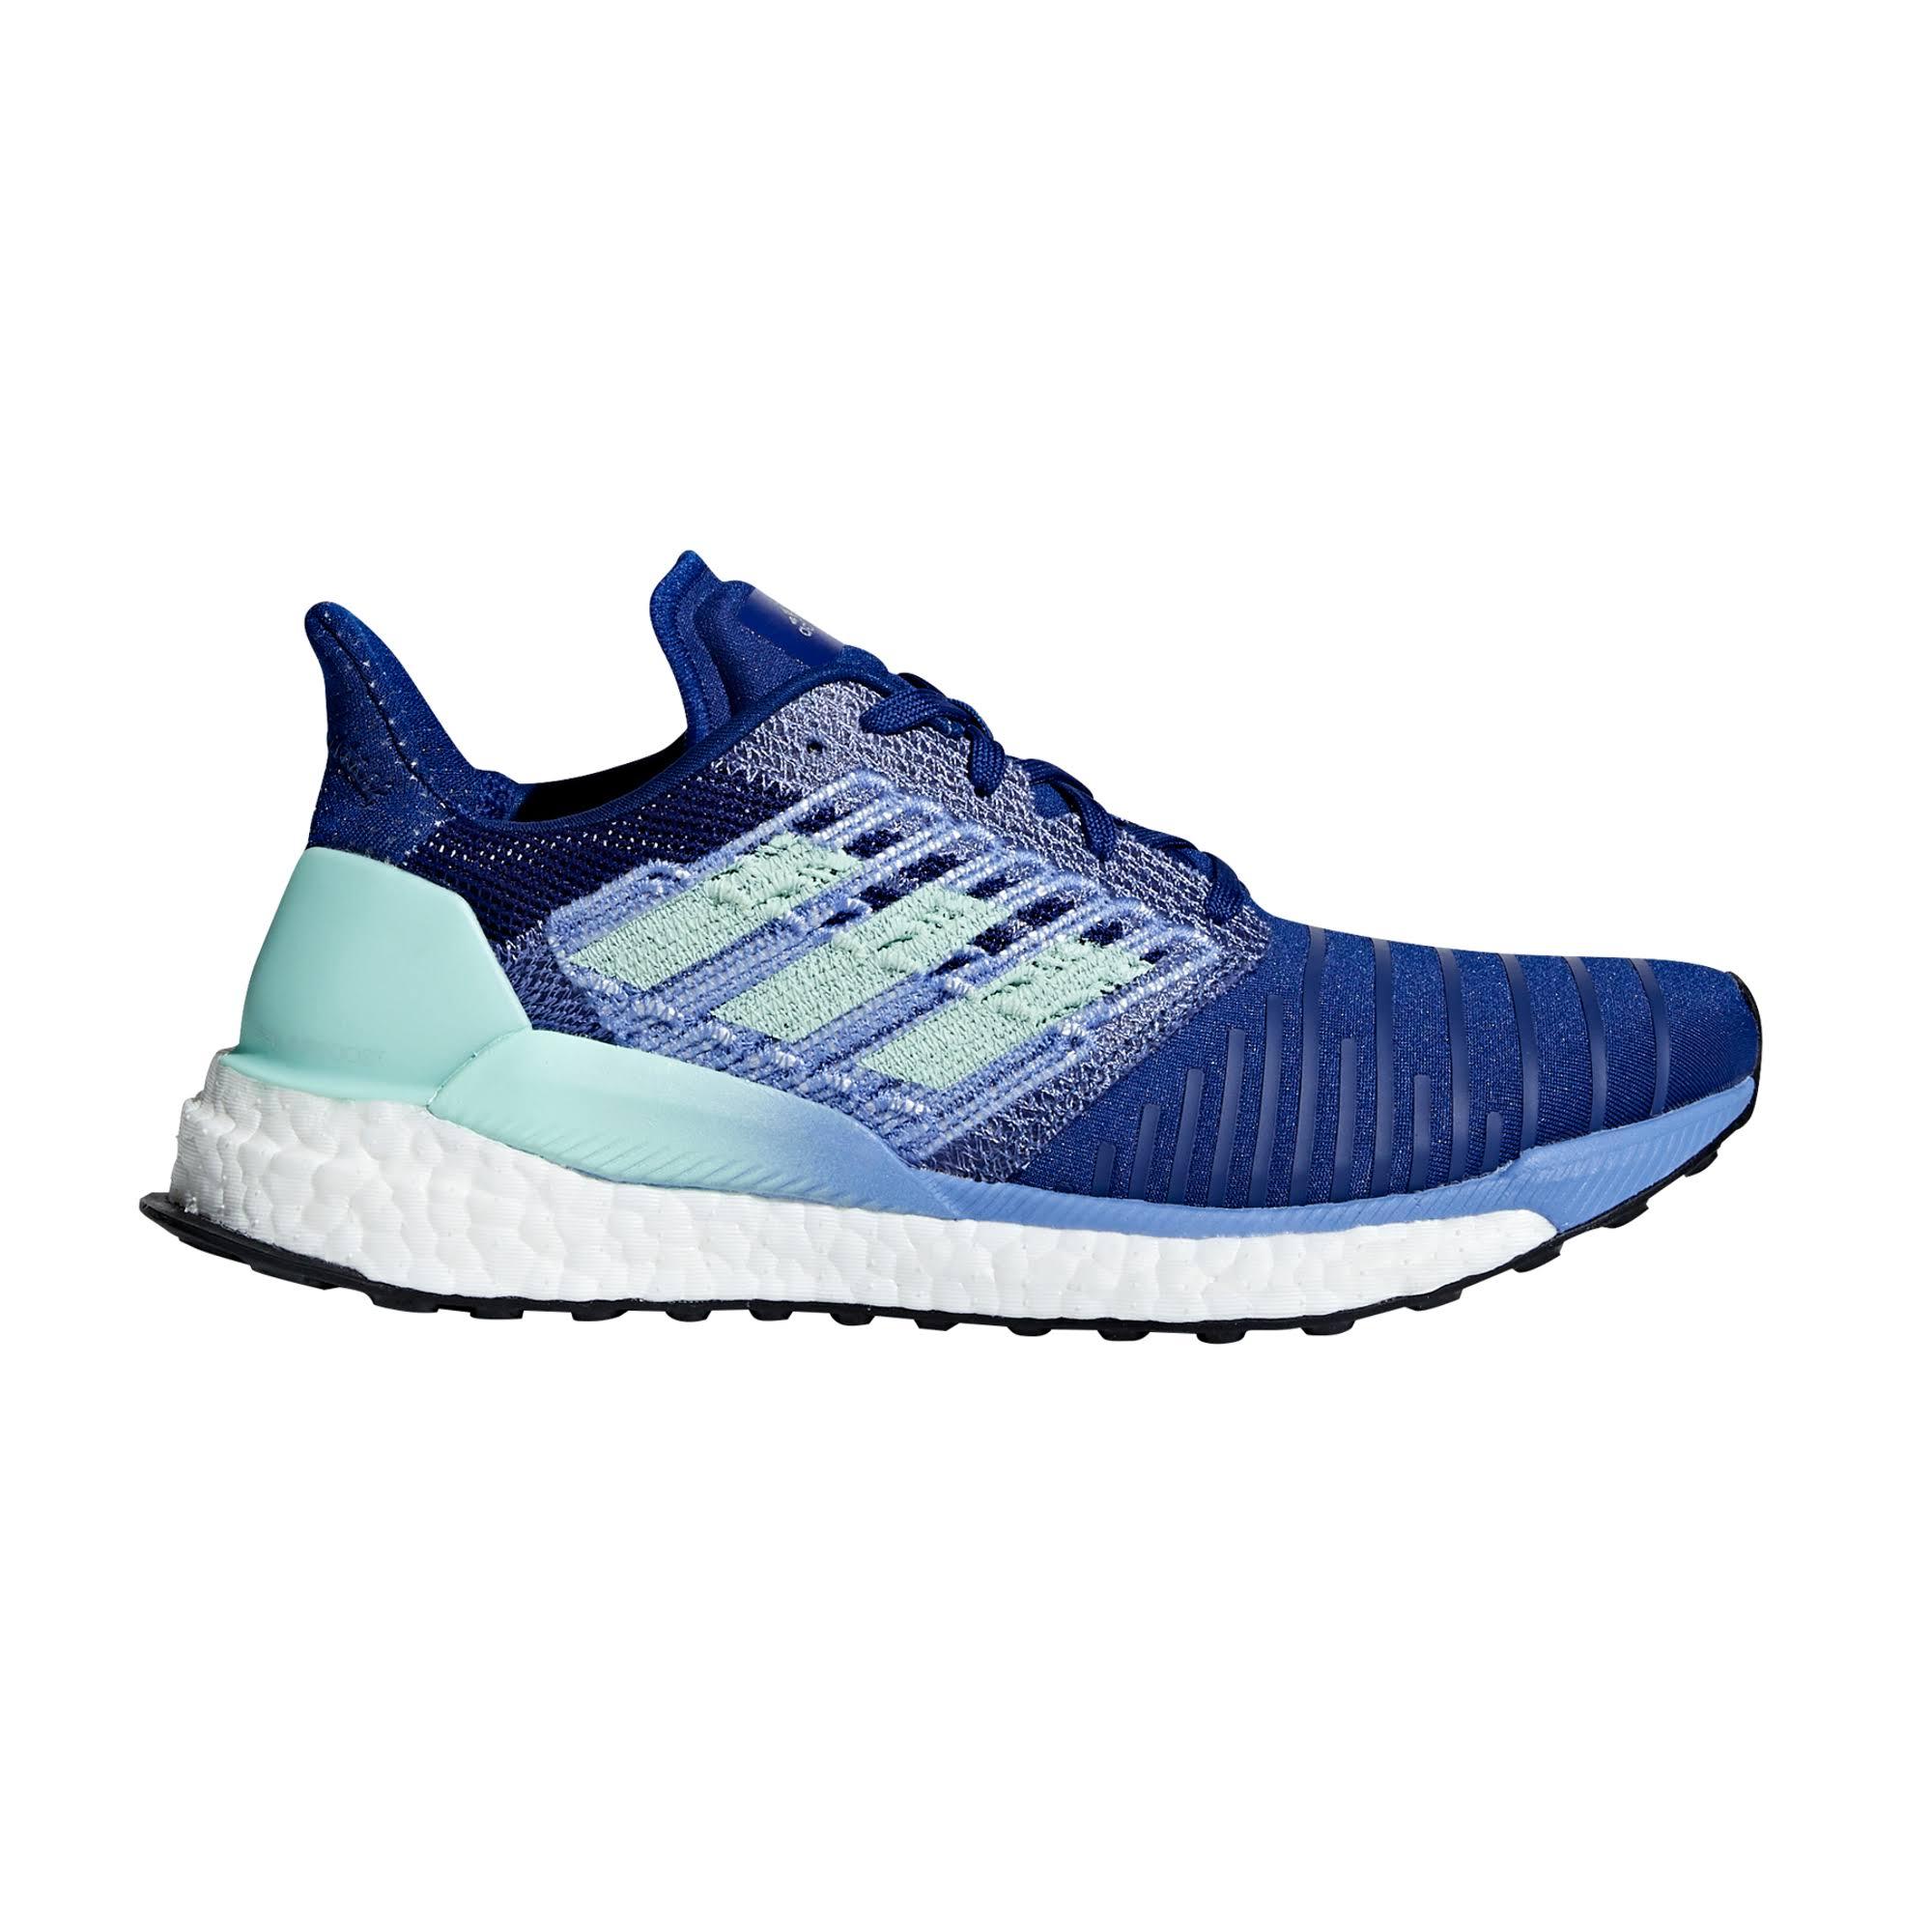 Adidas Solar Boost - Women's Running Shoes